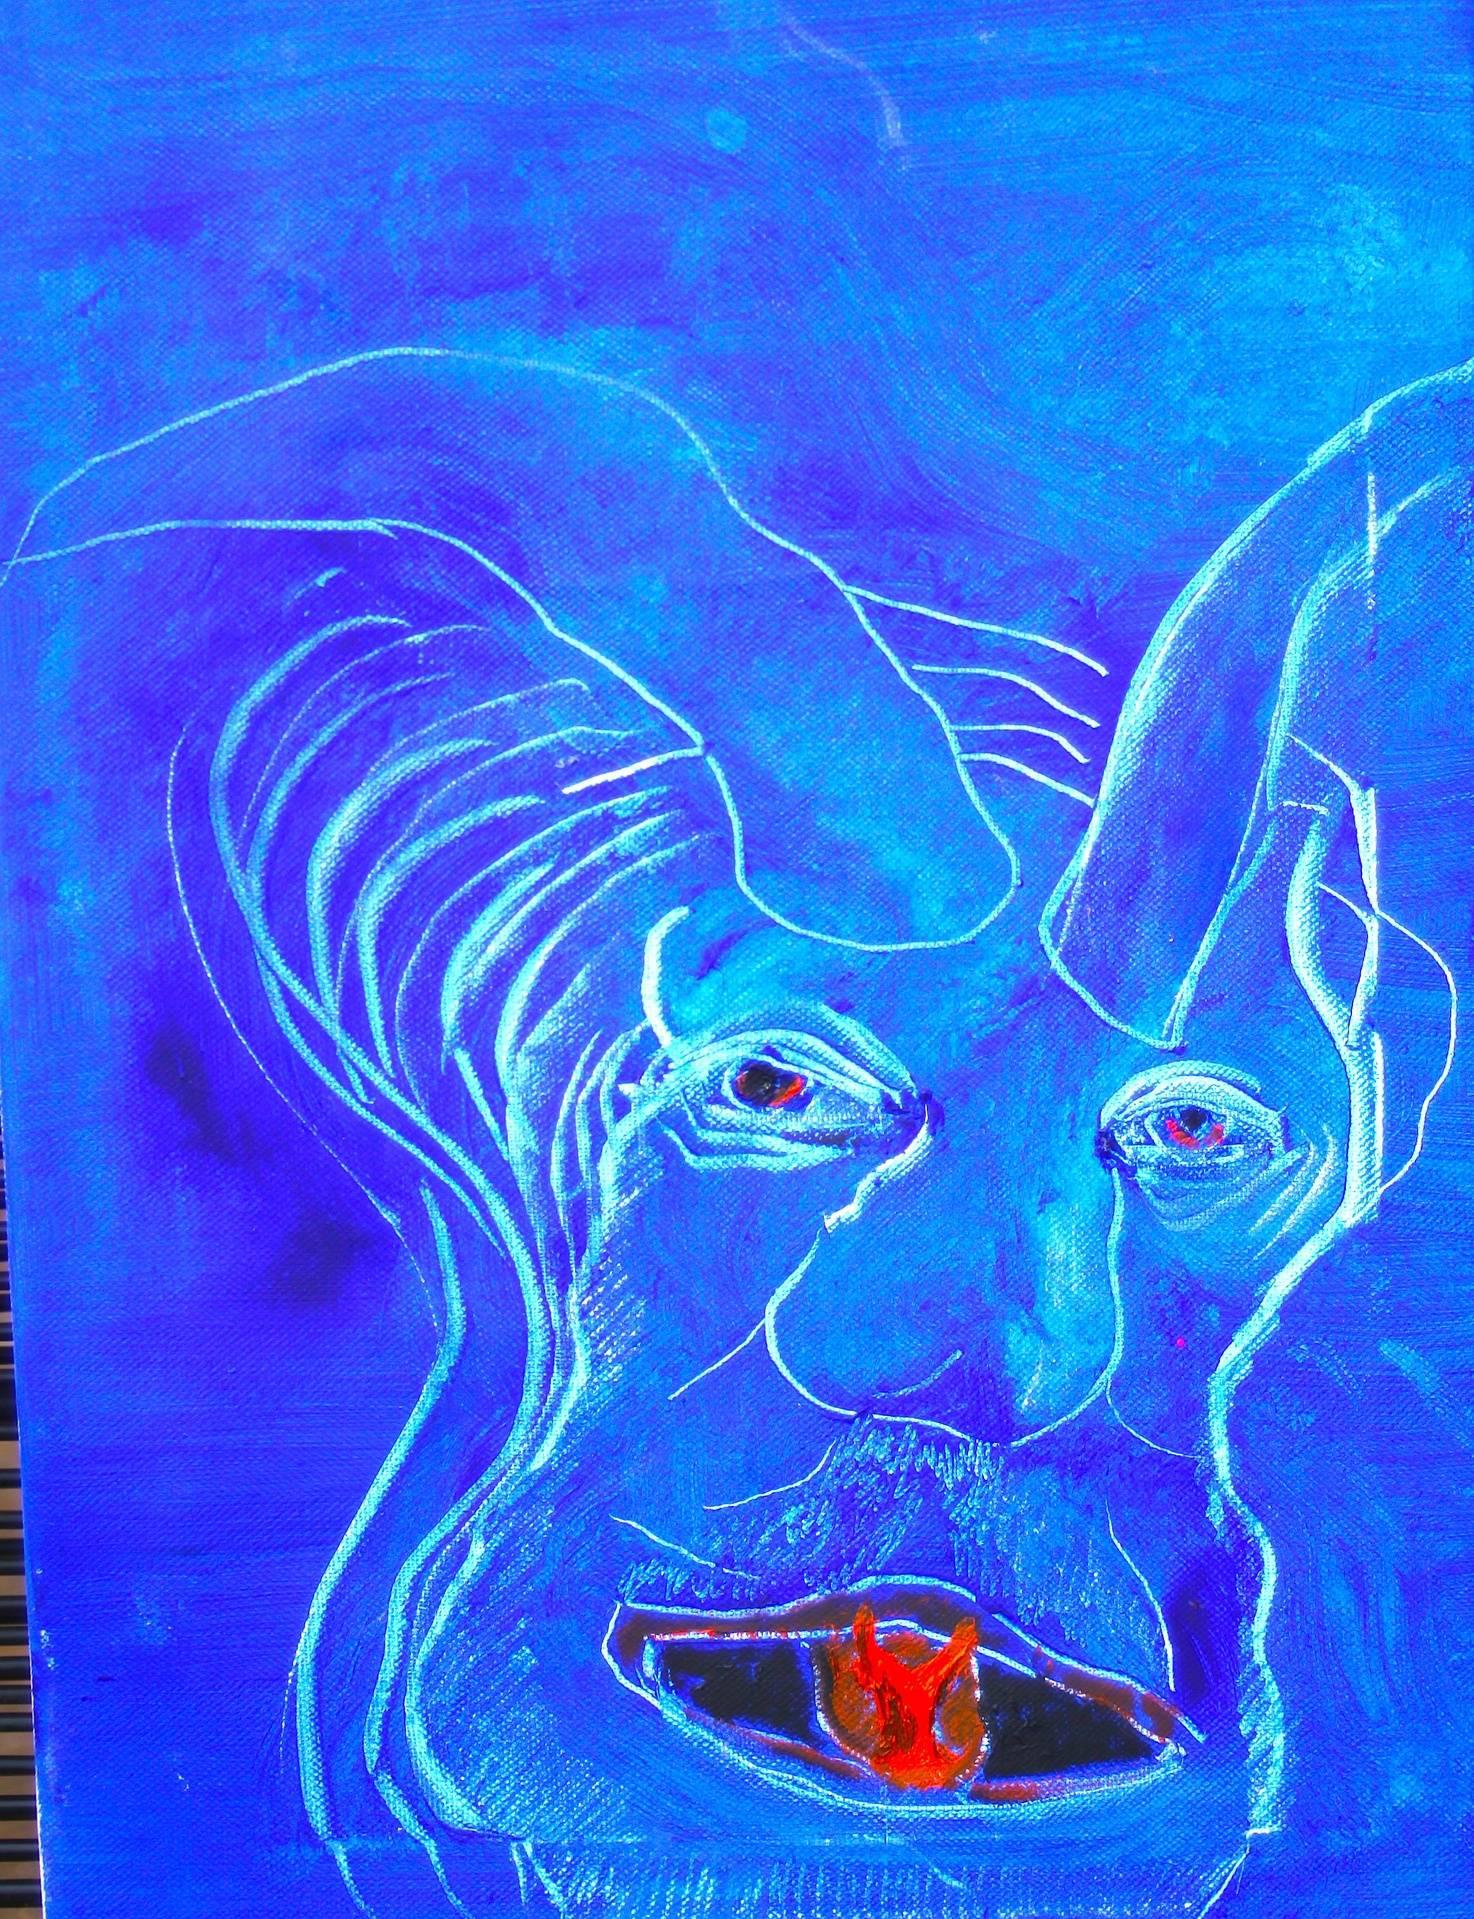 Blue devil ,what else?